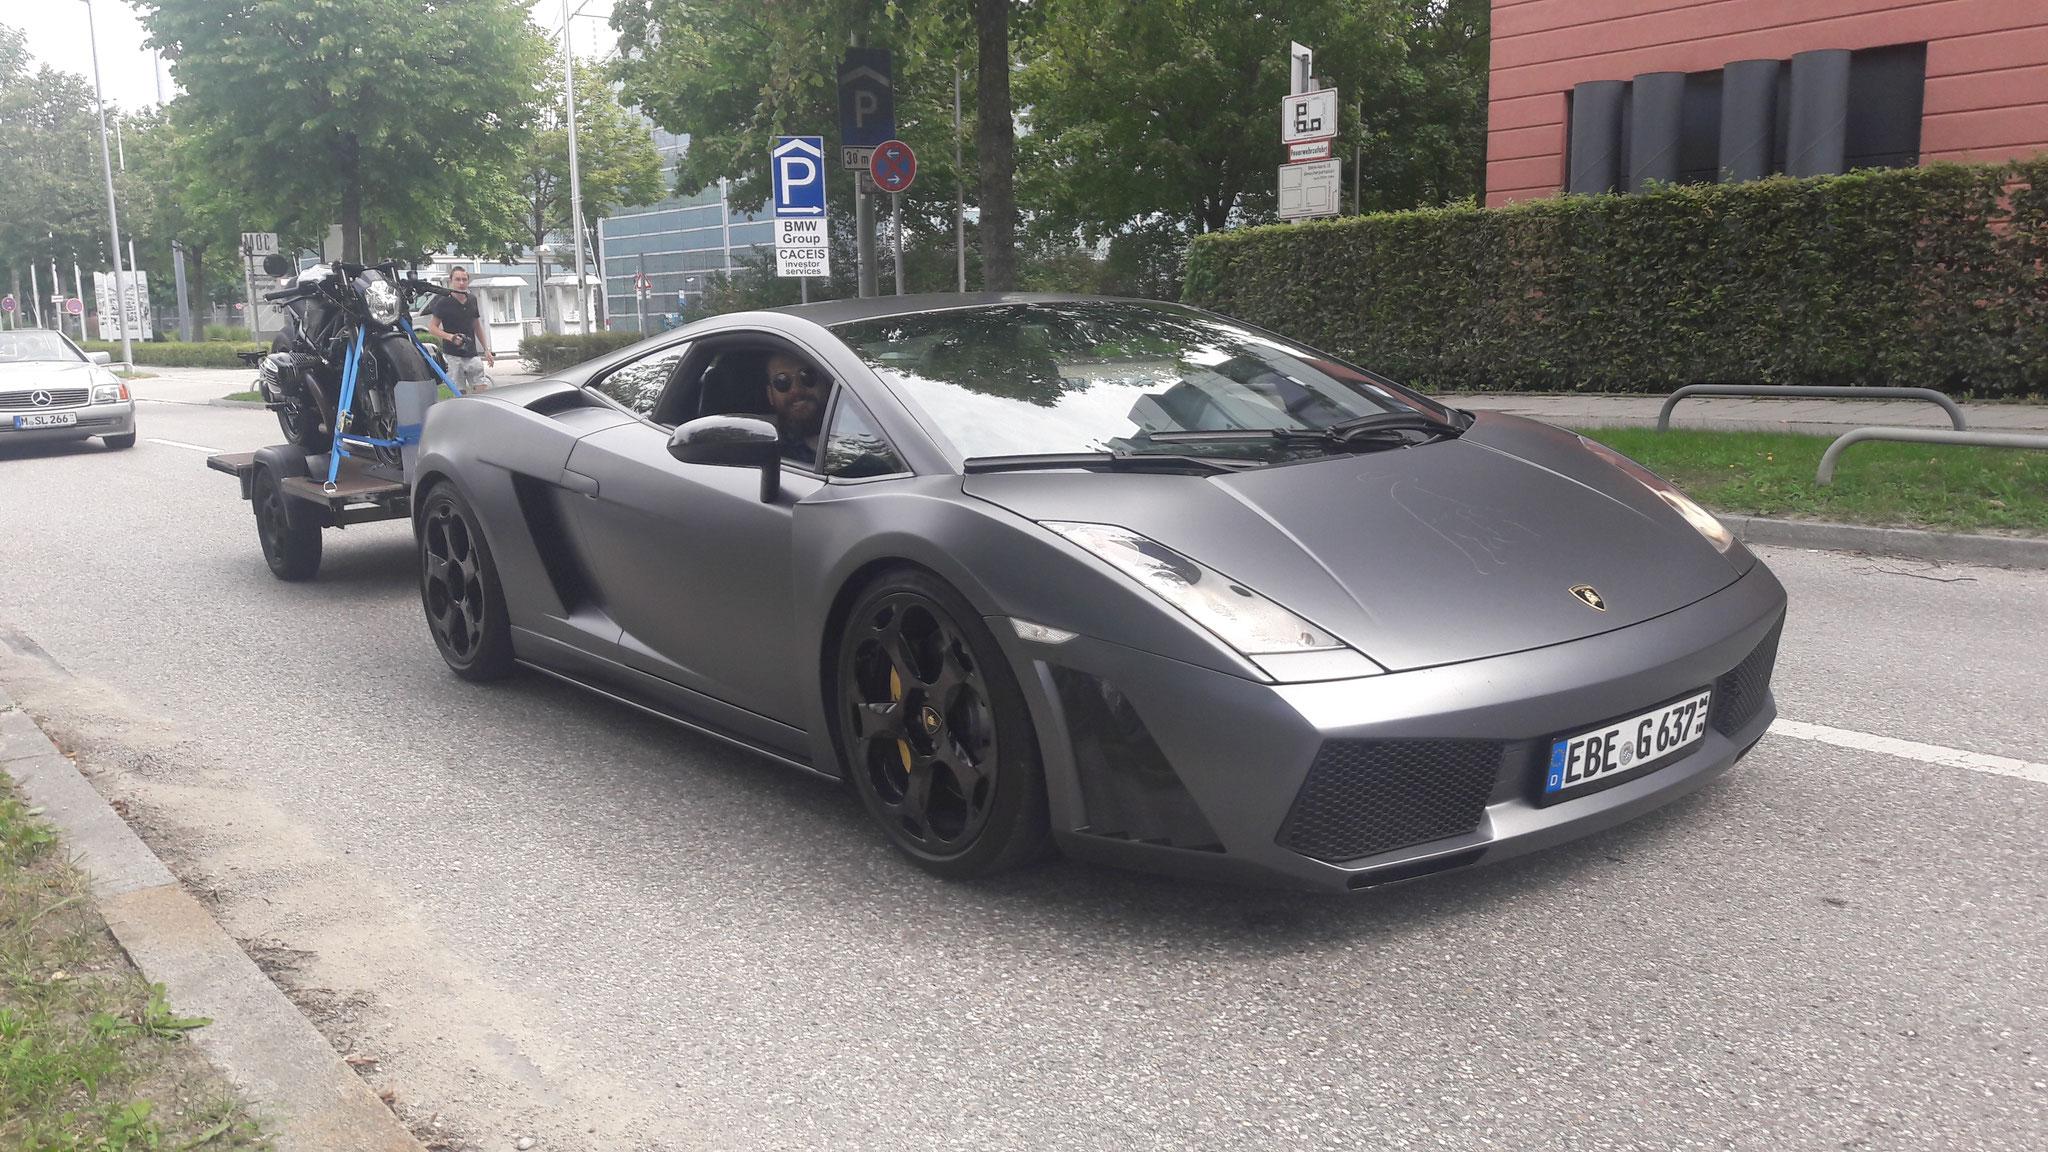 Lamborghini Gallardo Coupé - EBE-G-637